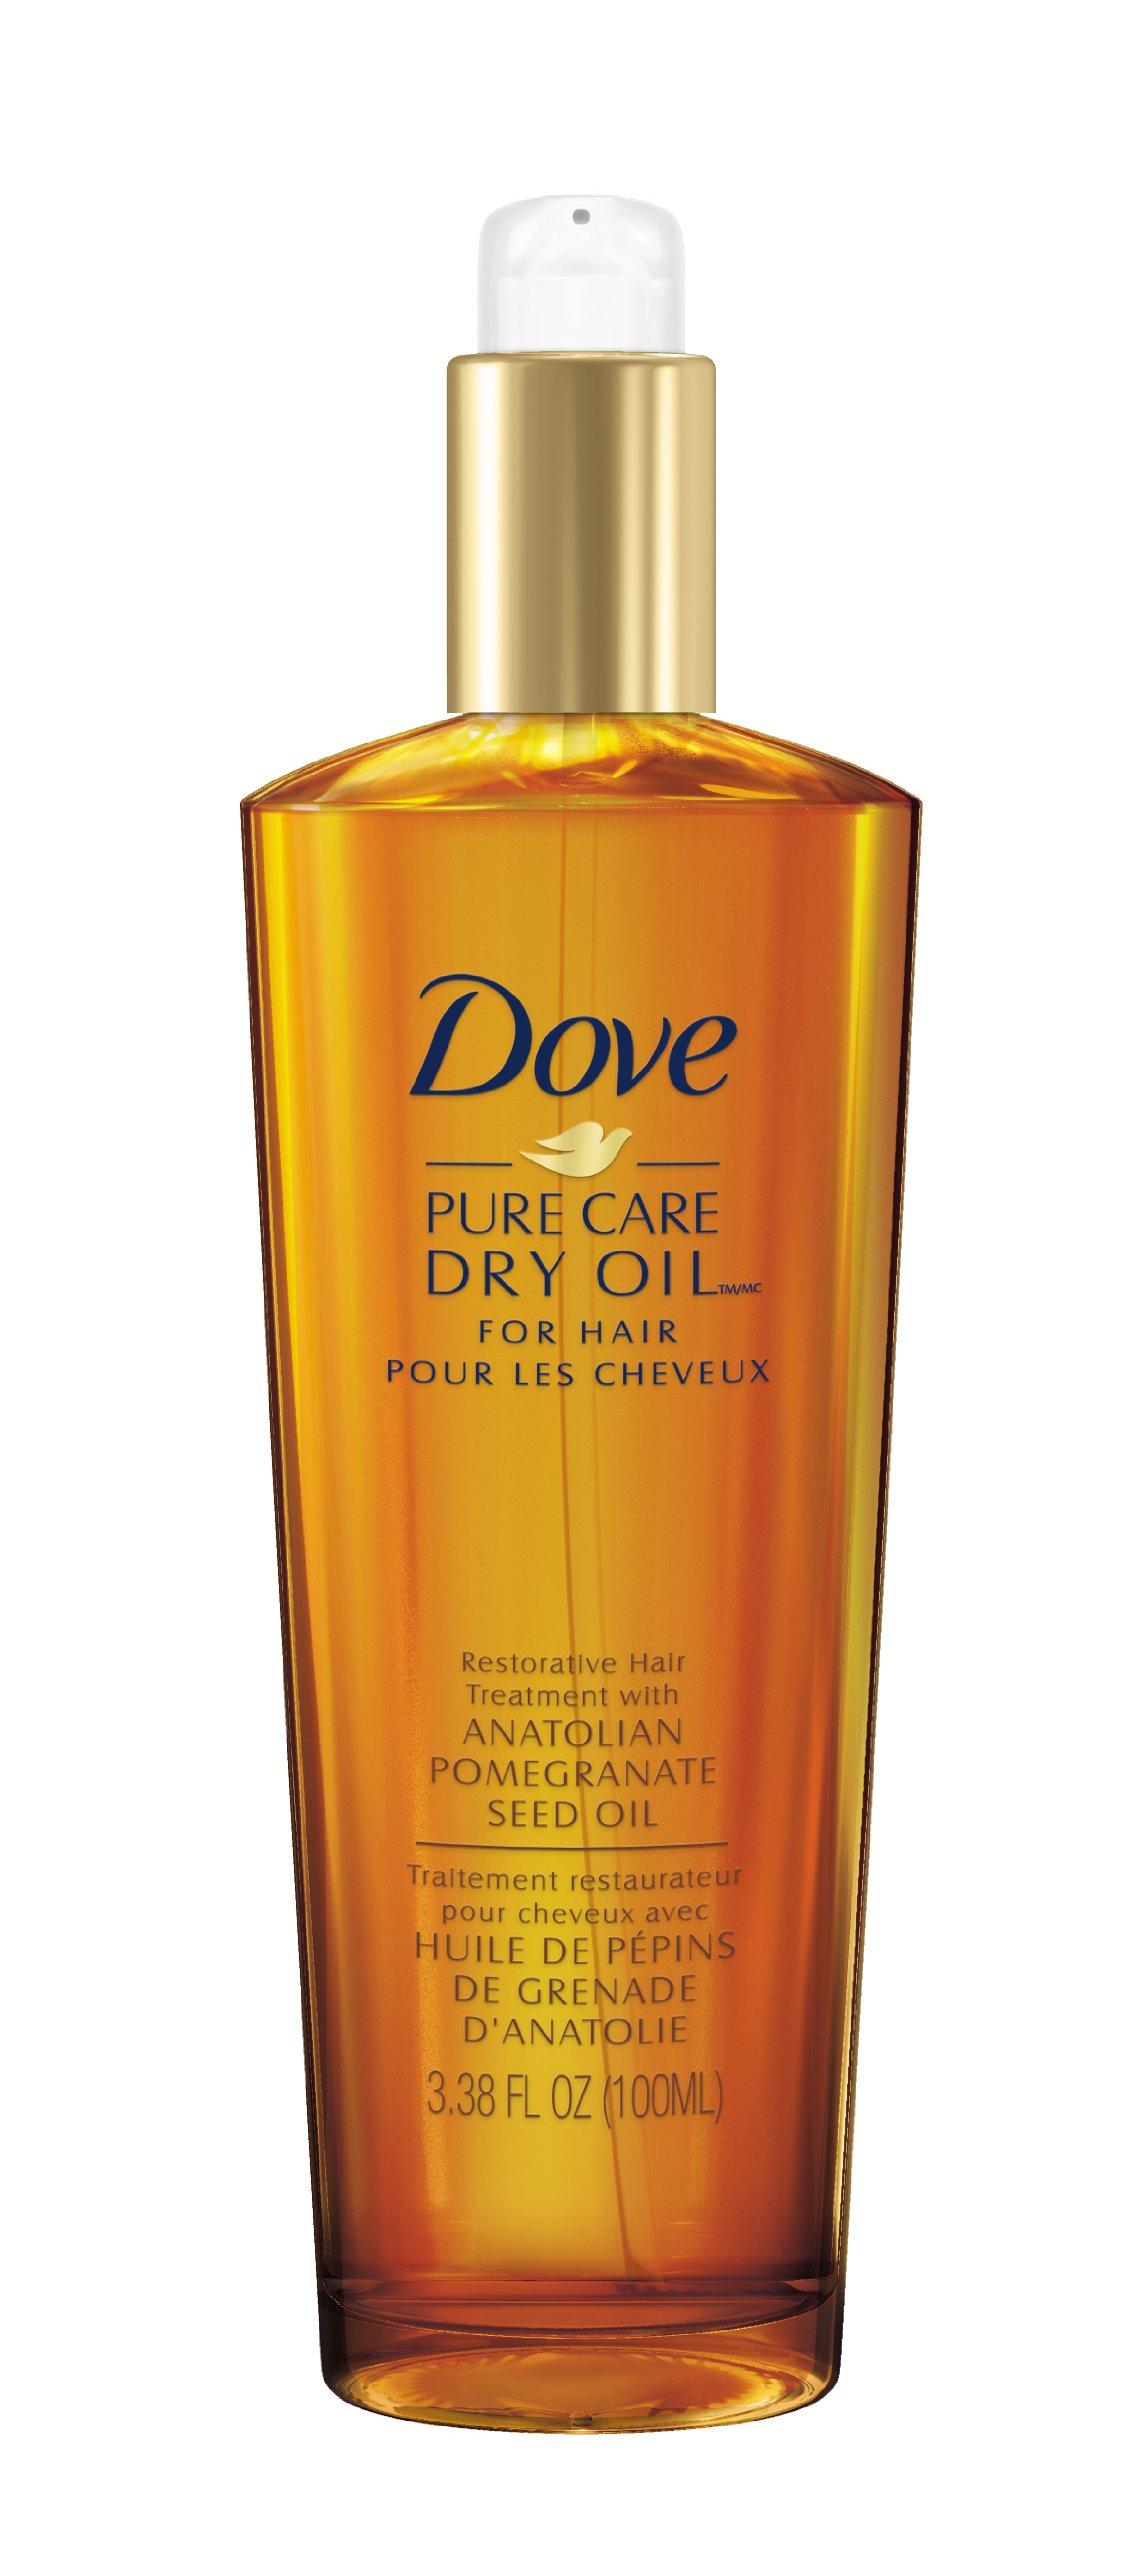 Dove Dry Oil, Pure Care Restorative Hair Treatment 3.38 oz (100ml)